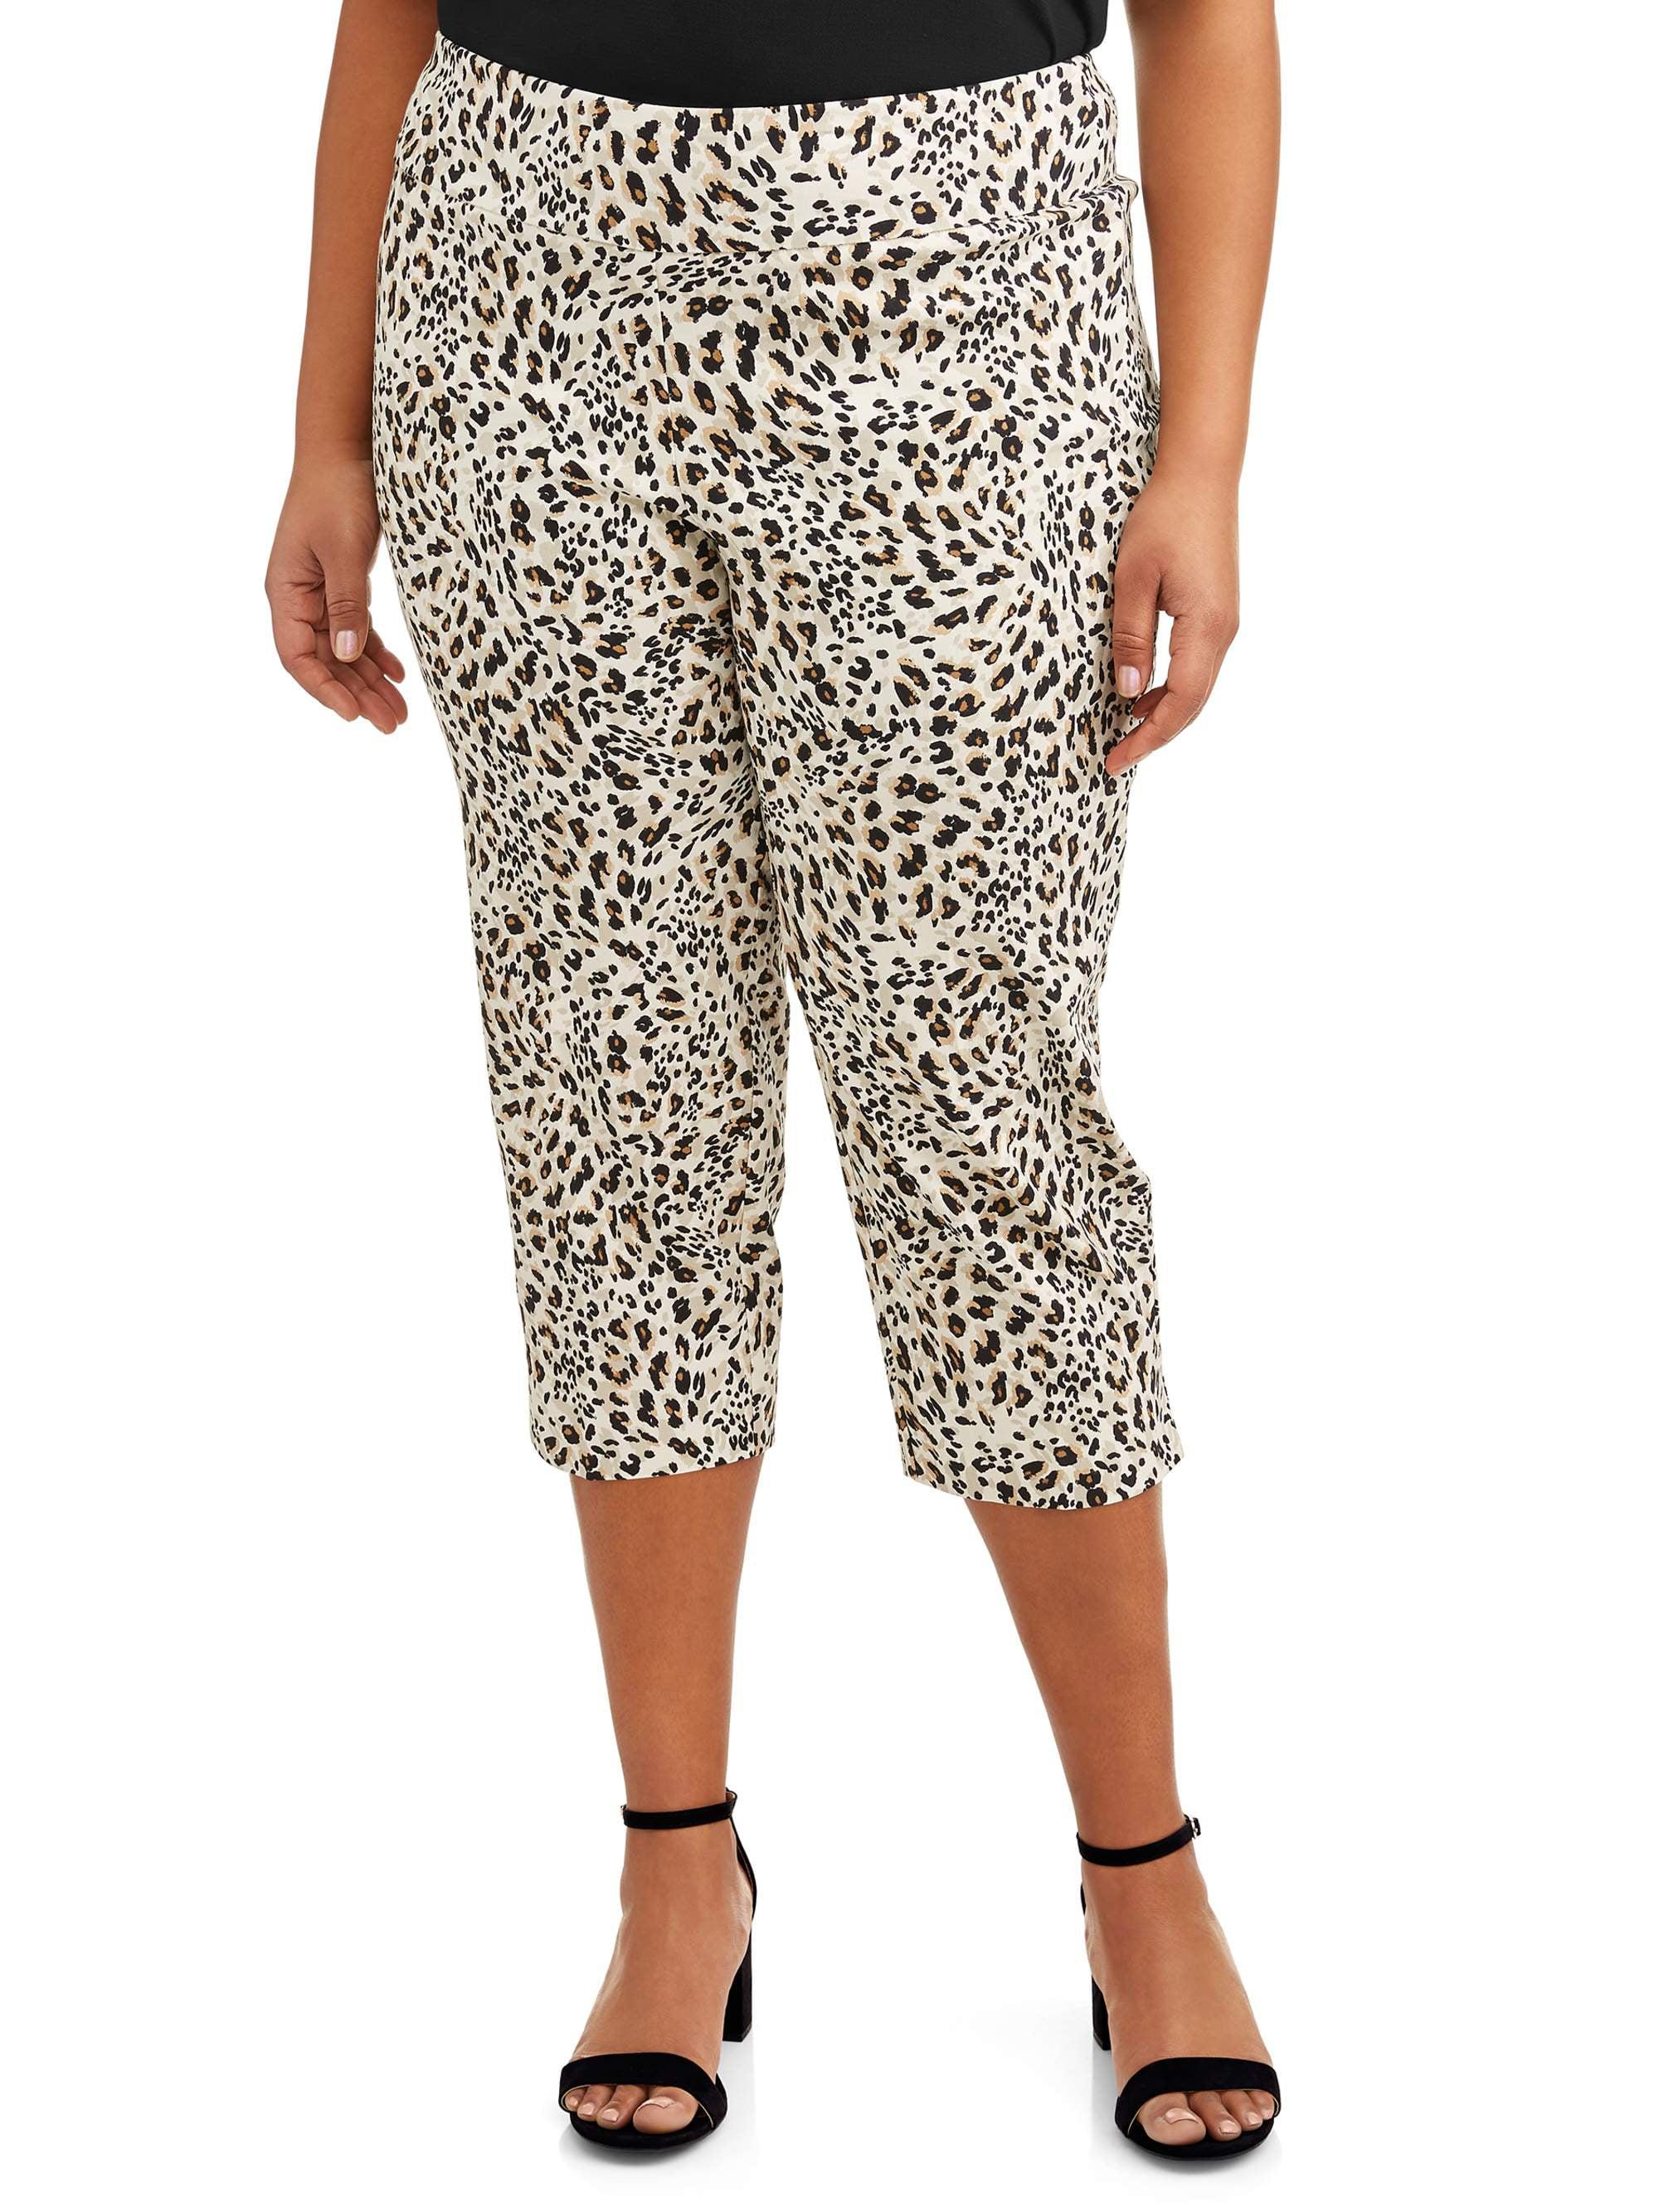 Women's Plus Size Leopard Print Cropped Pant